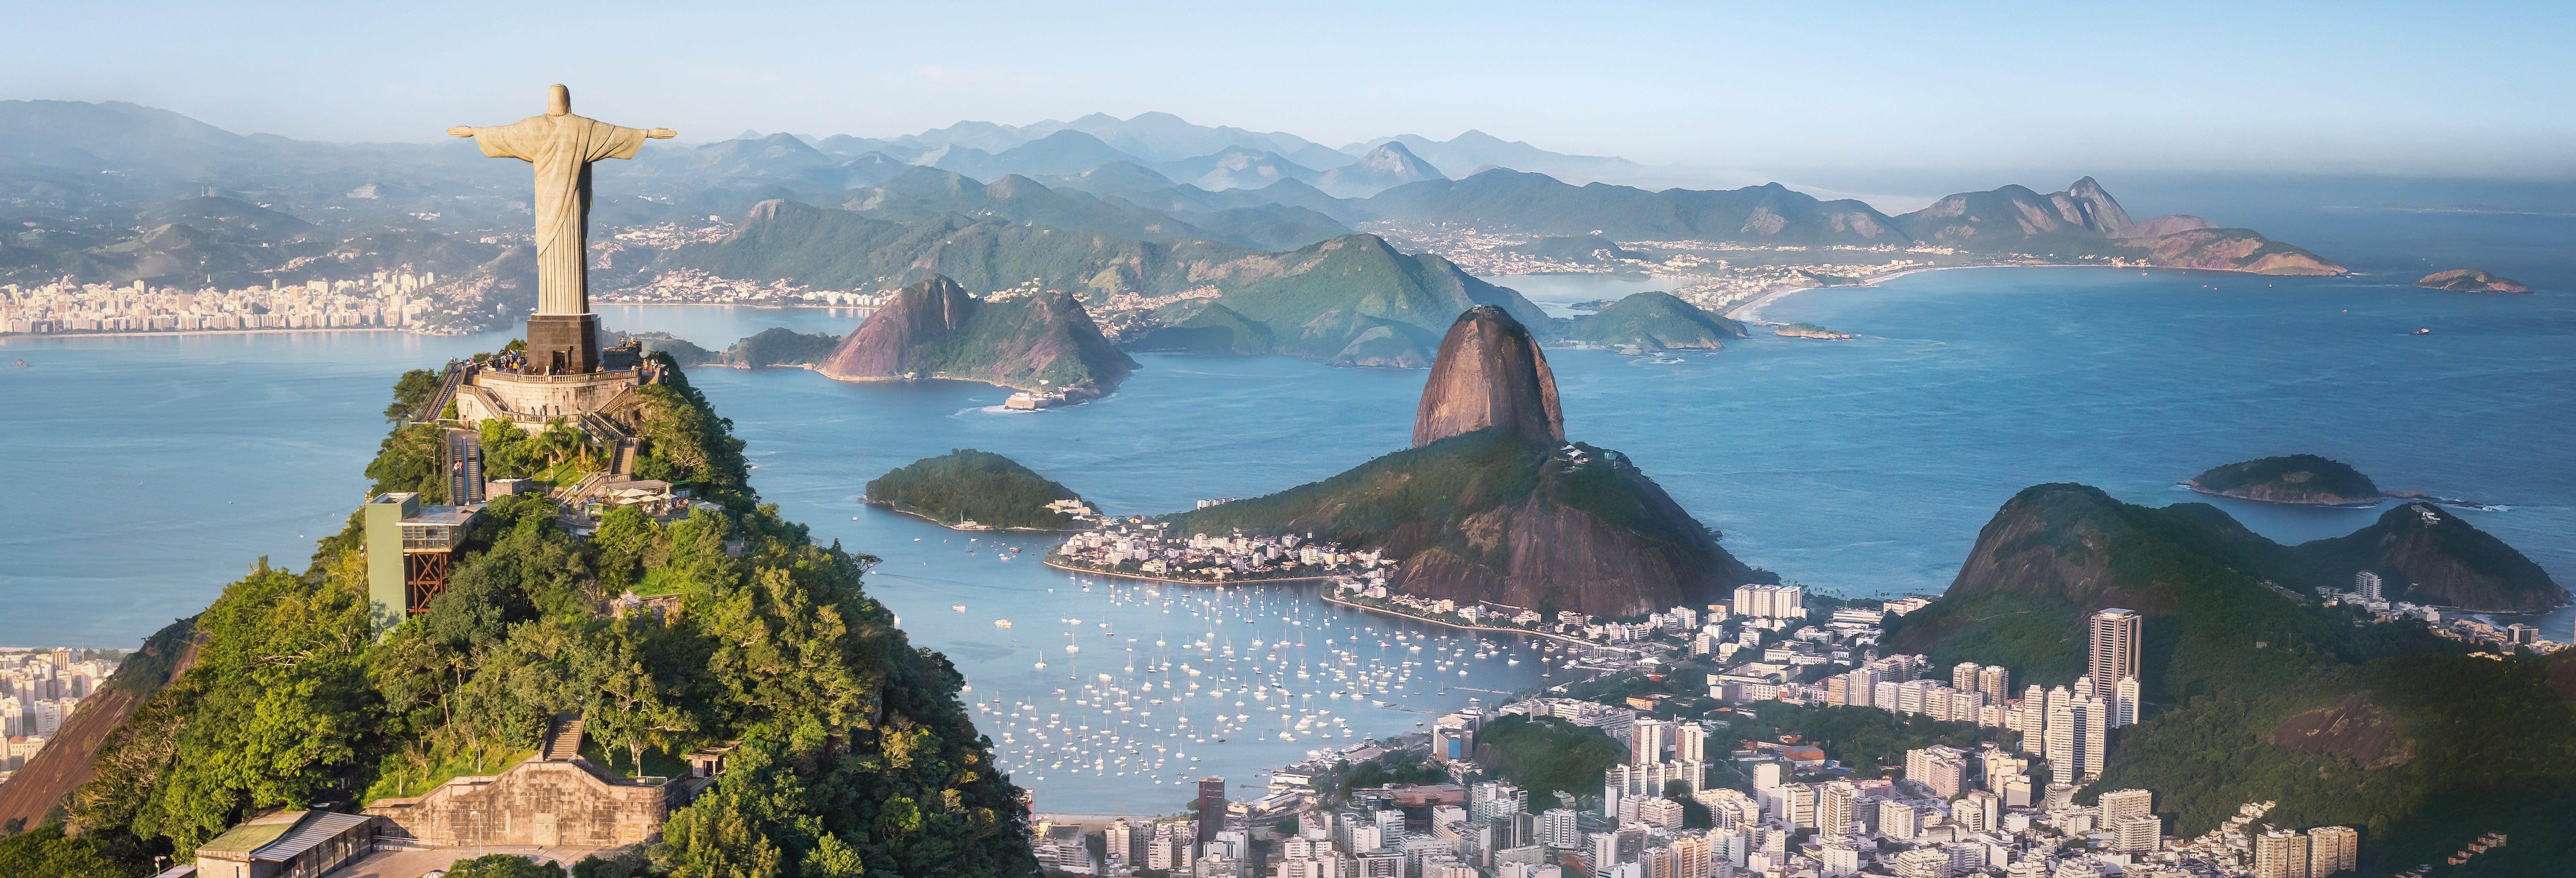 Rio de Janeiro Day Tour